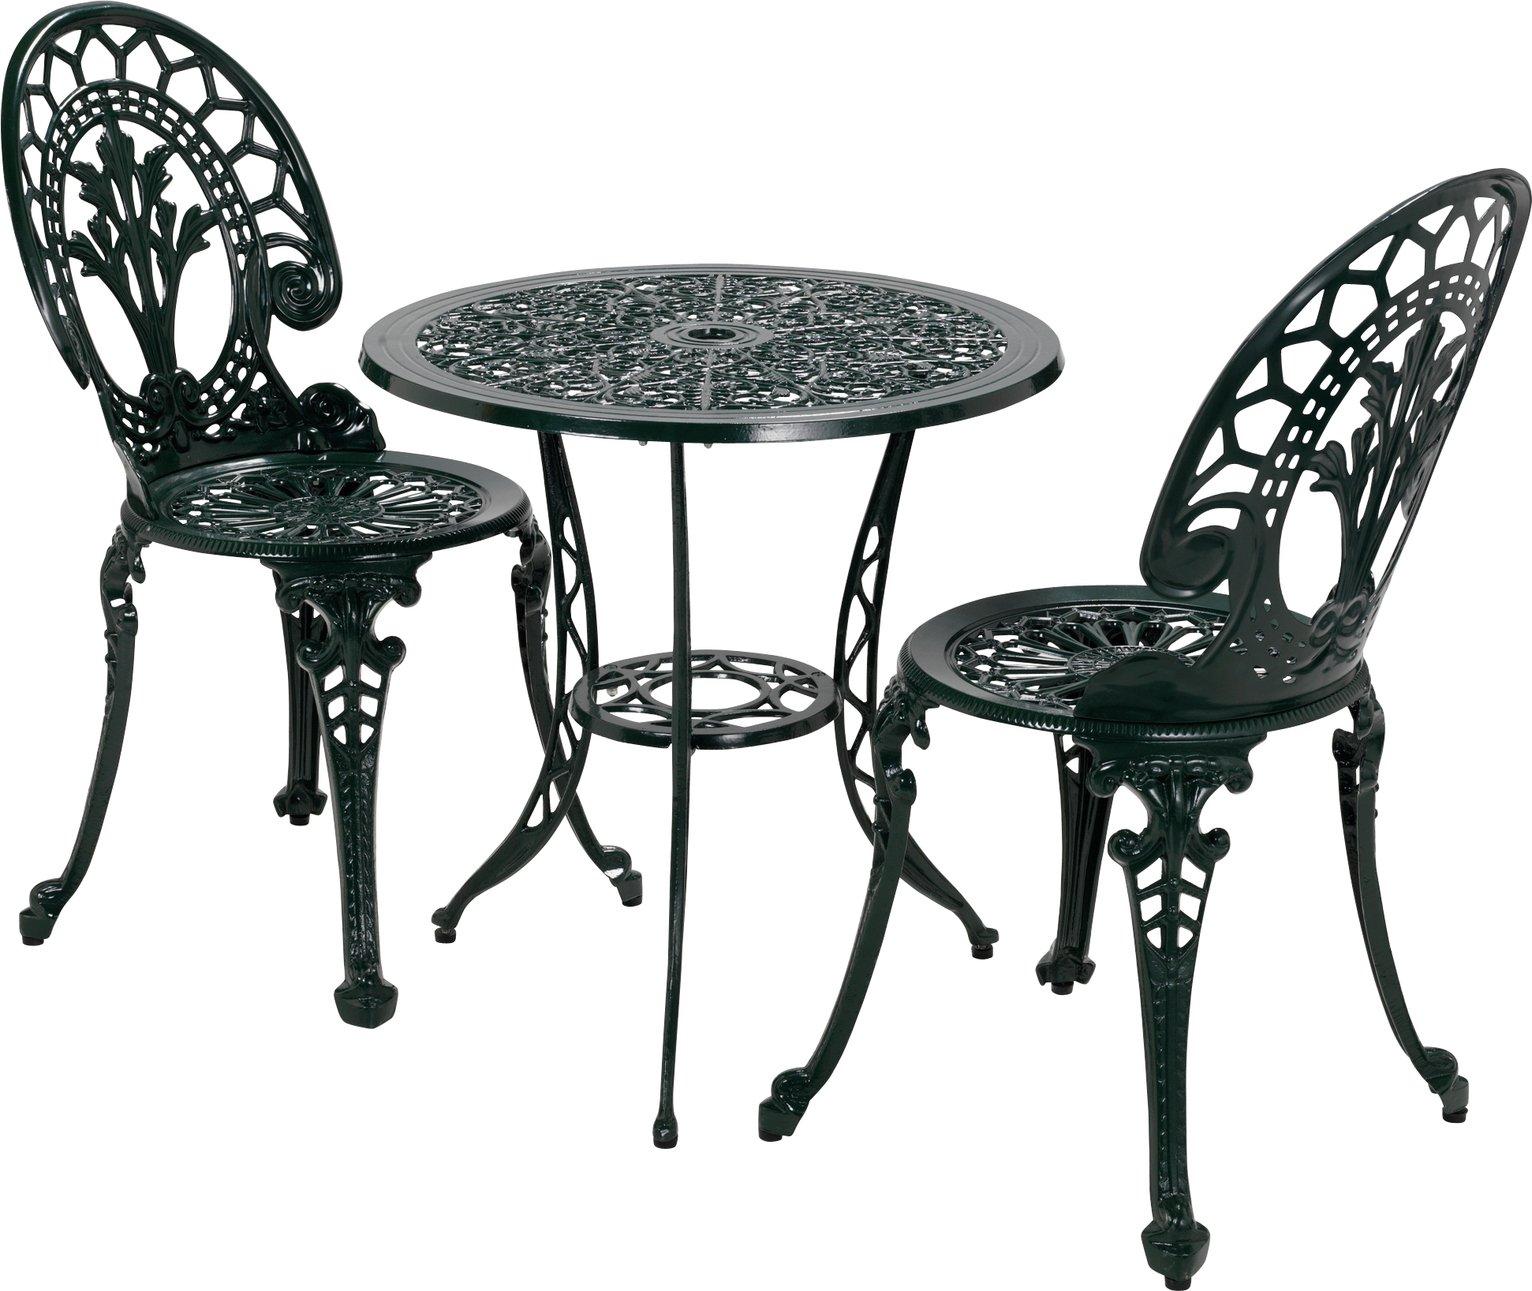 Garden Table And Chair Sets Argos